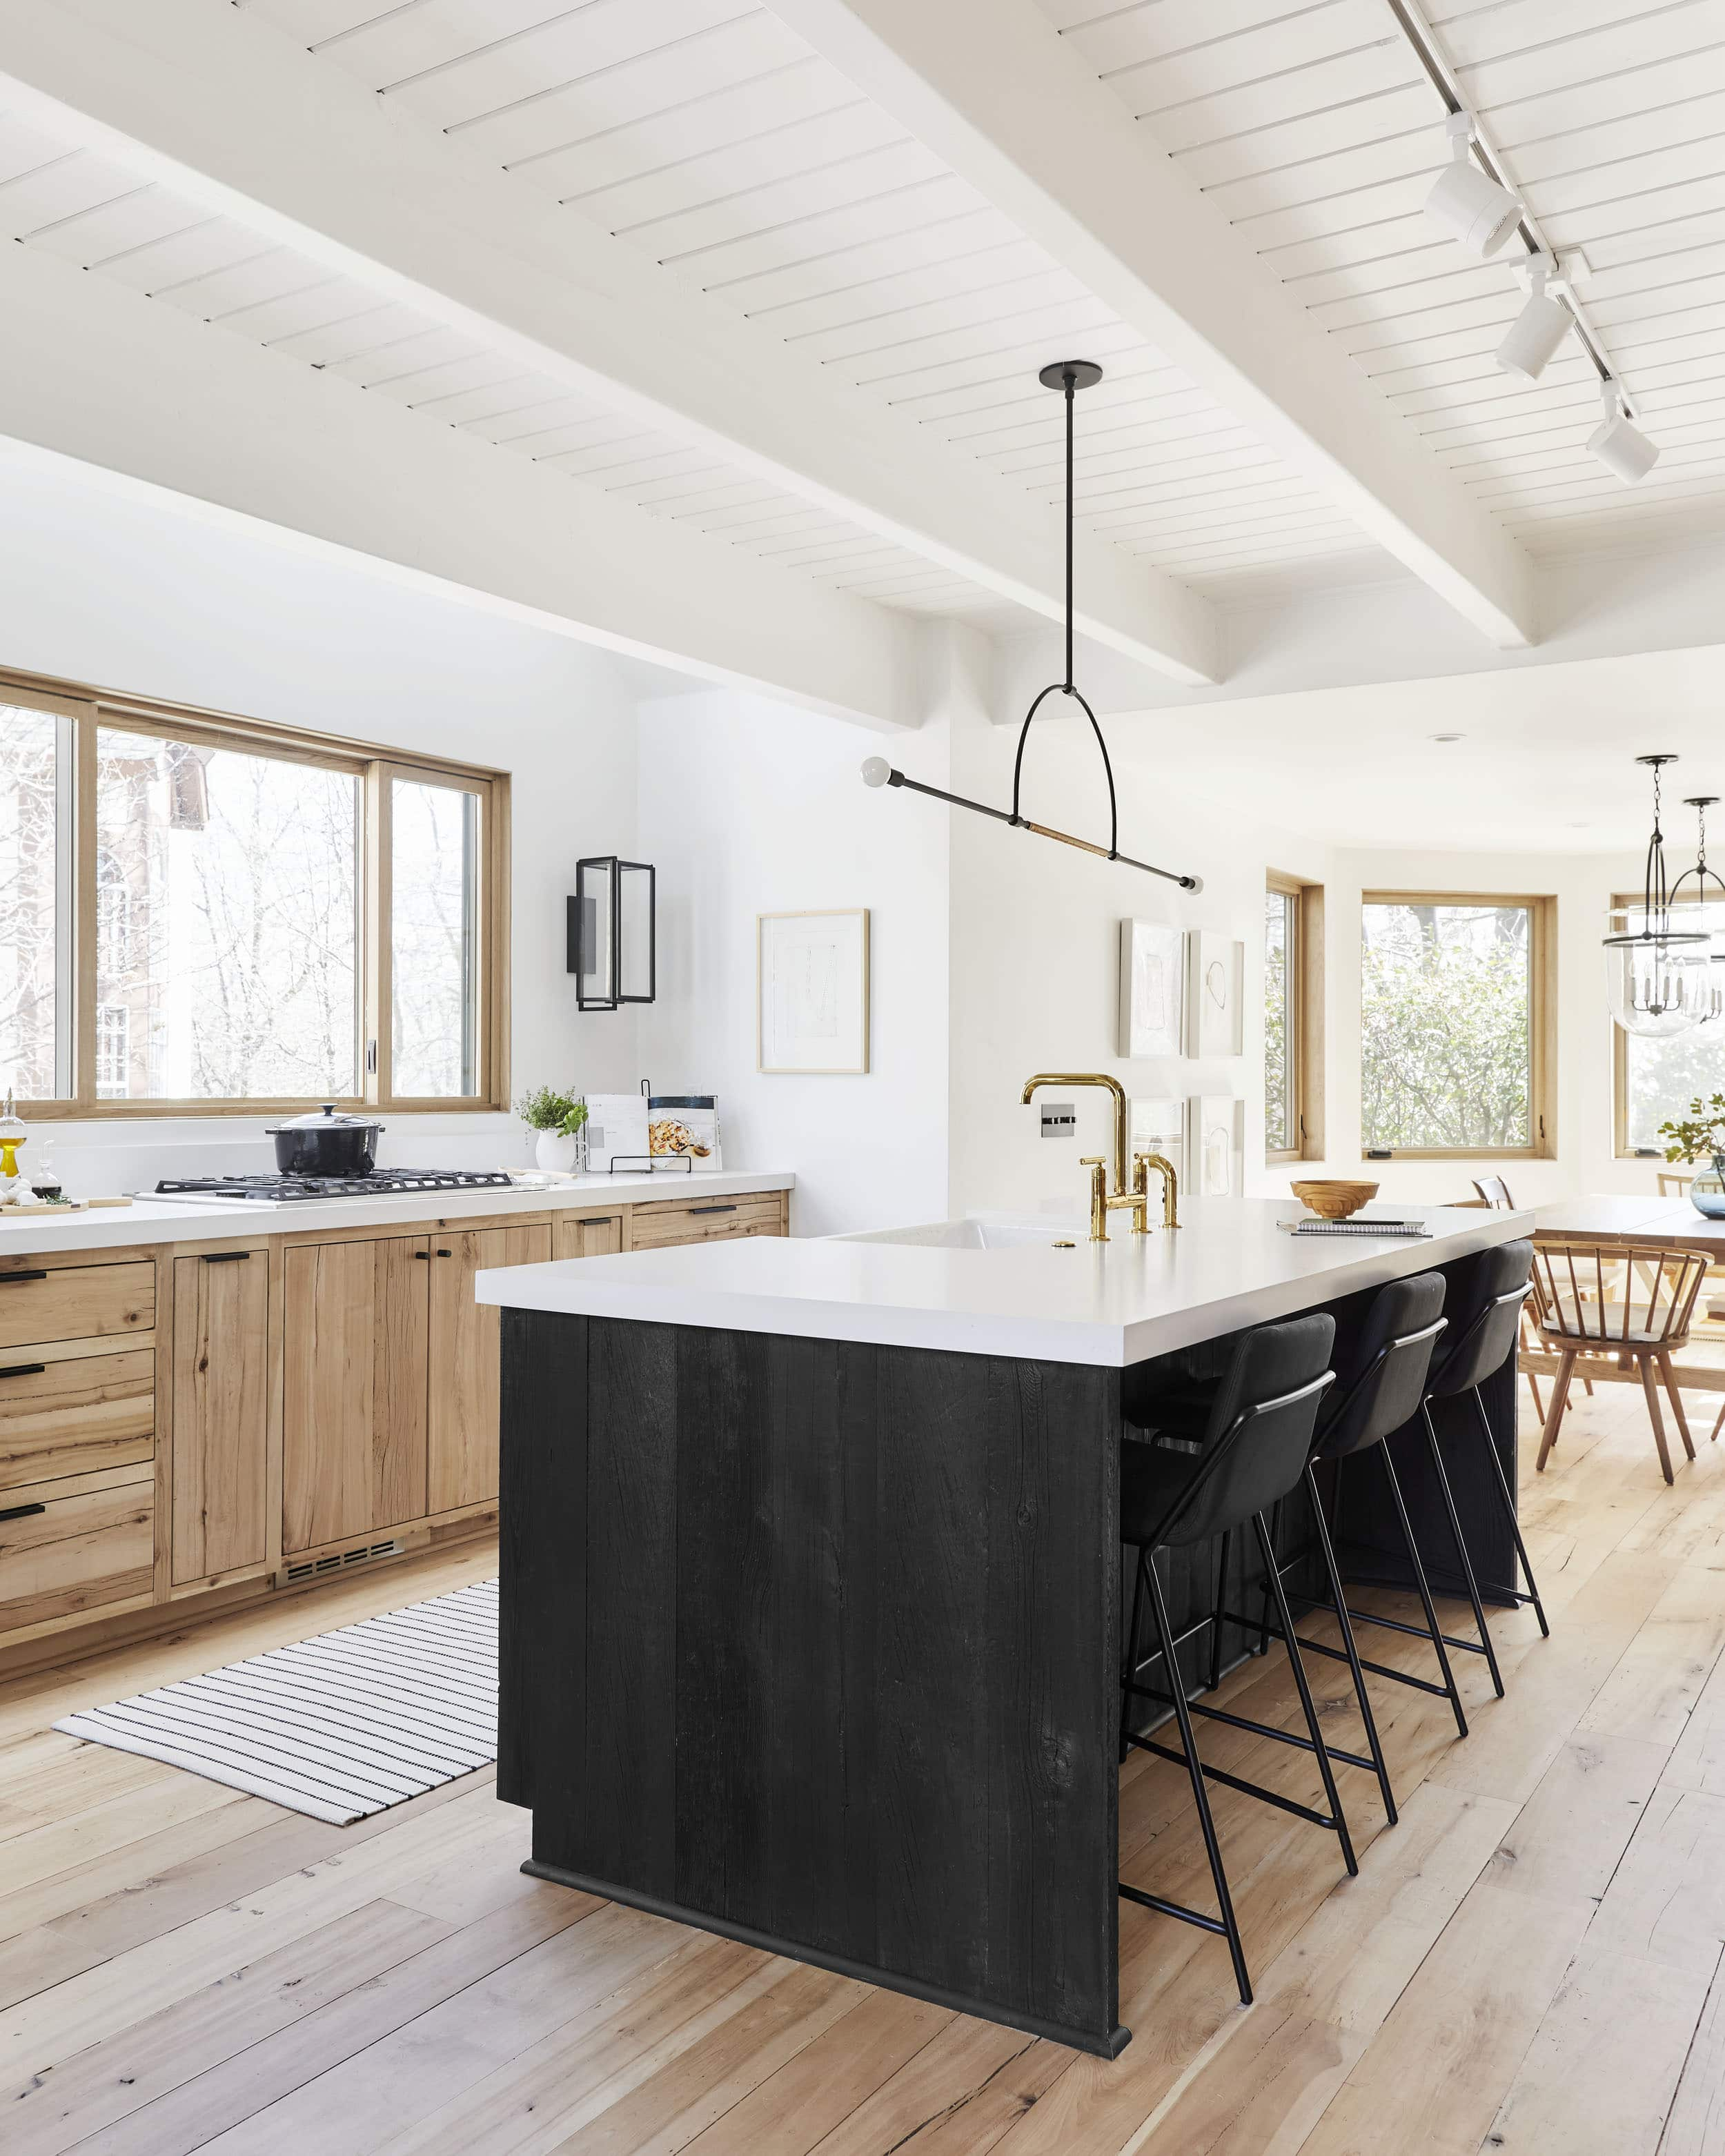 Emily Henderson Mountain House Scandinavian kitchen remodel_20